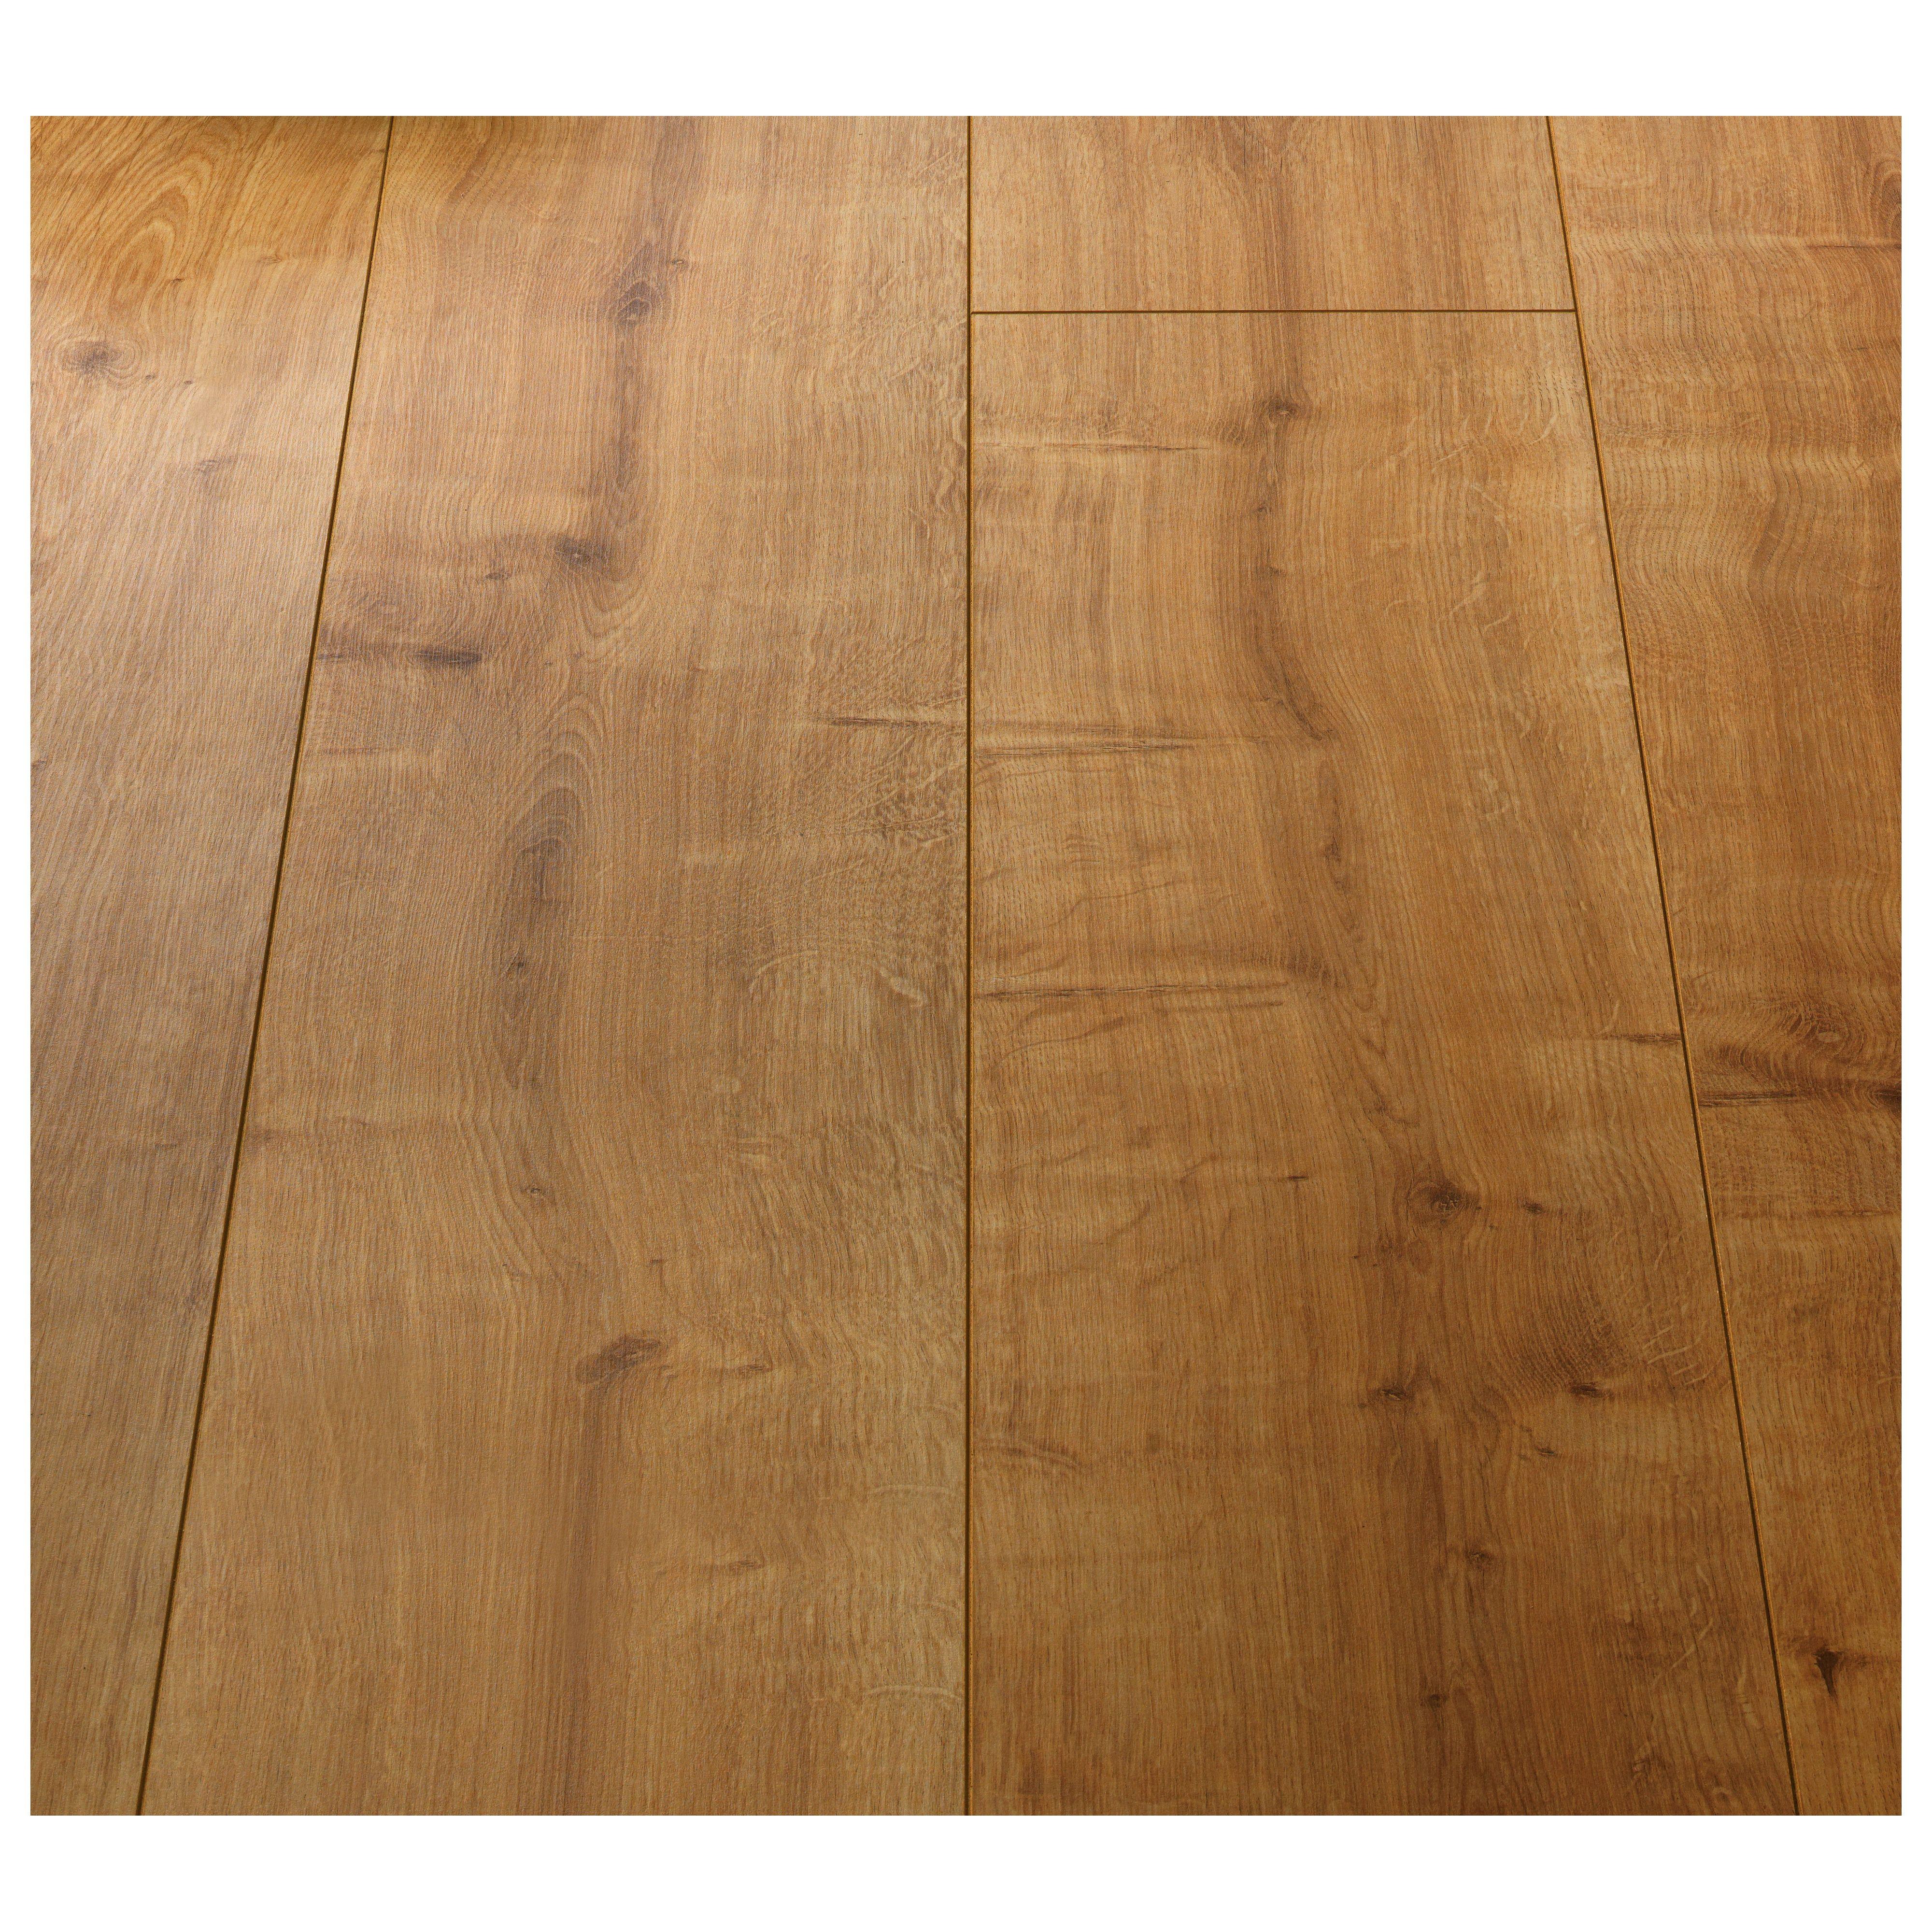 Palomino Oak Laminate Flooring 1 48sq M Per Pack